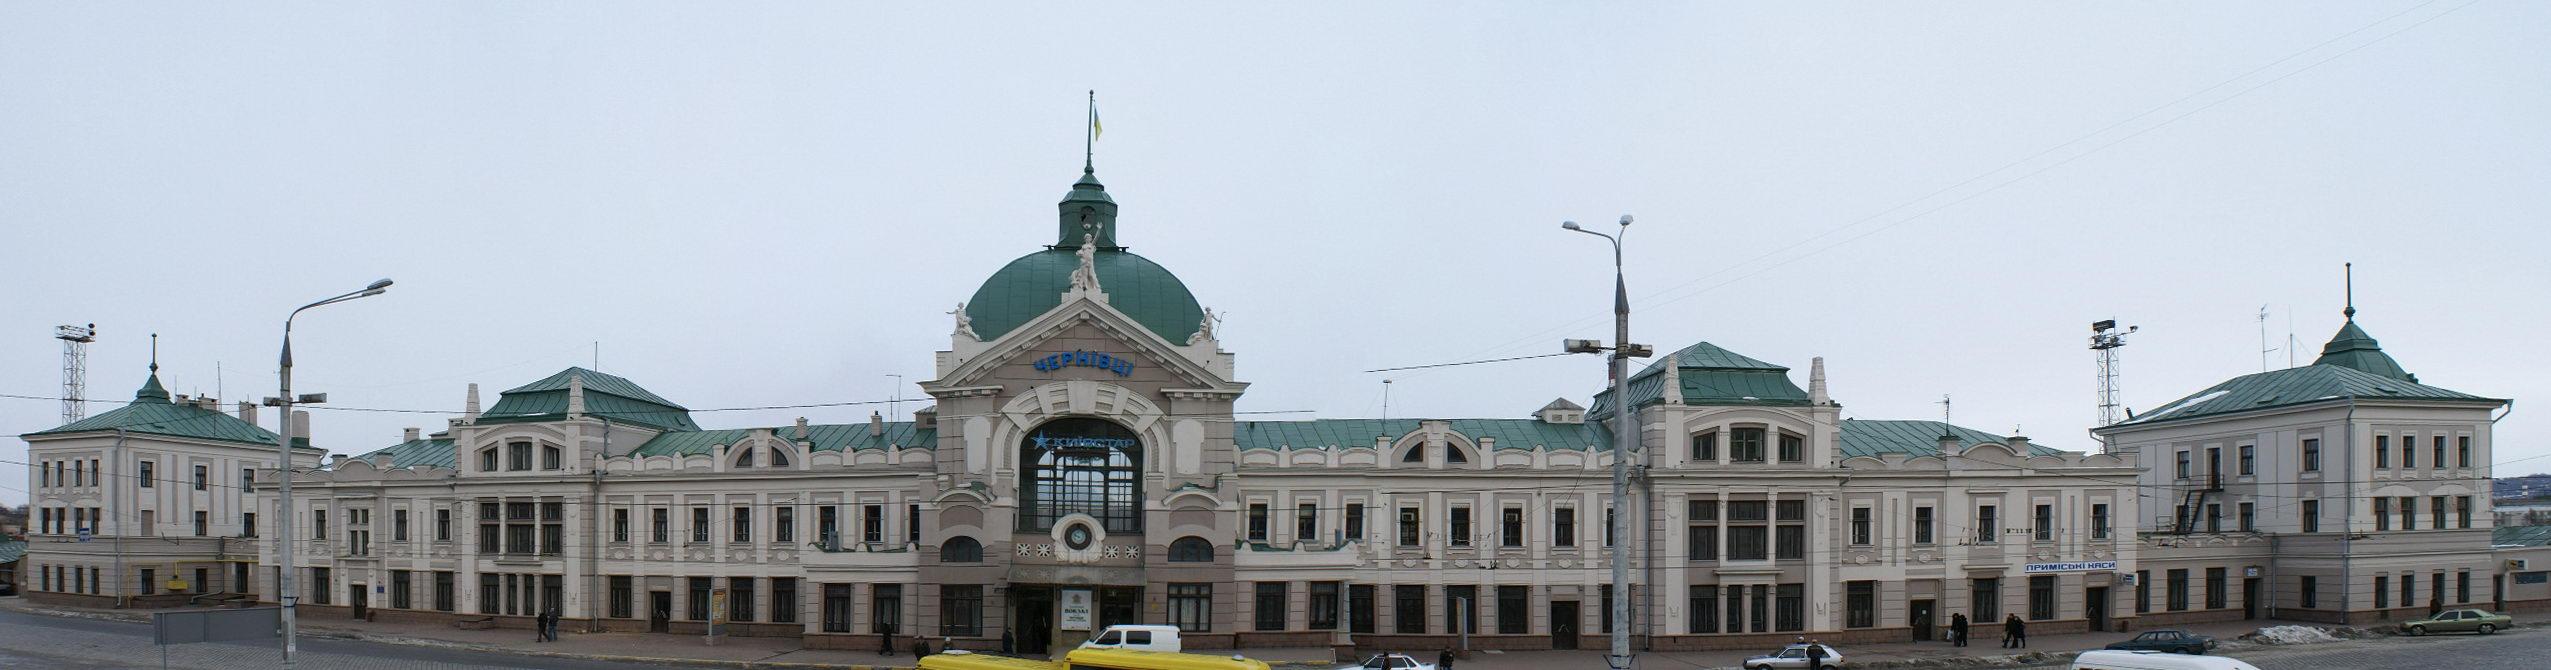 Фото Черновцы Вокзал панорама